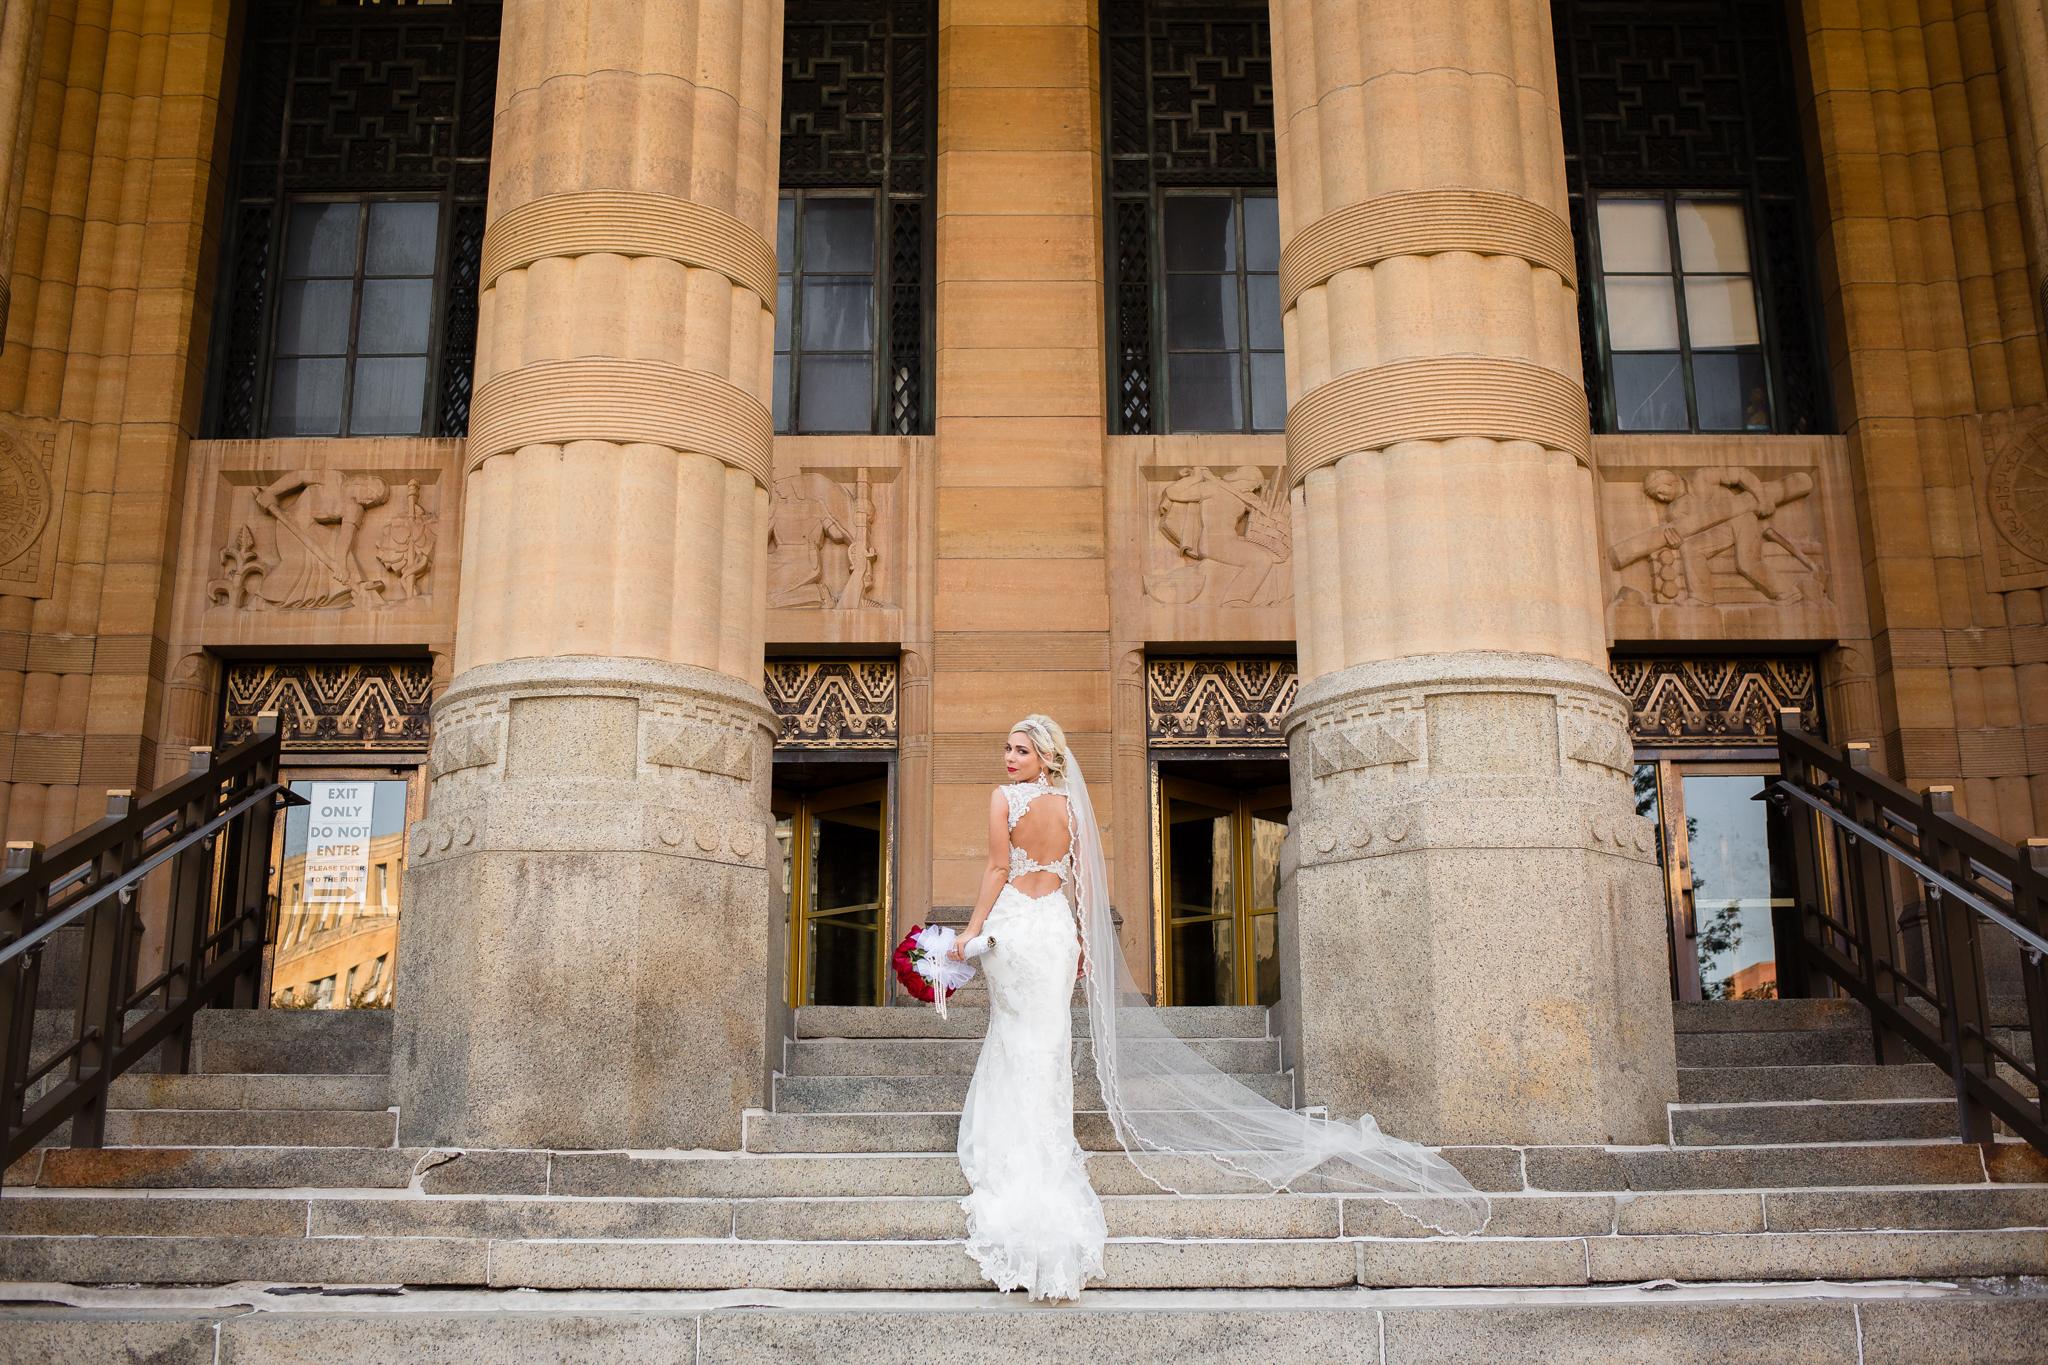 Statler-City-Buffalo-wedding-photographer- 0359.jpg